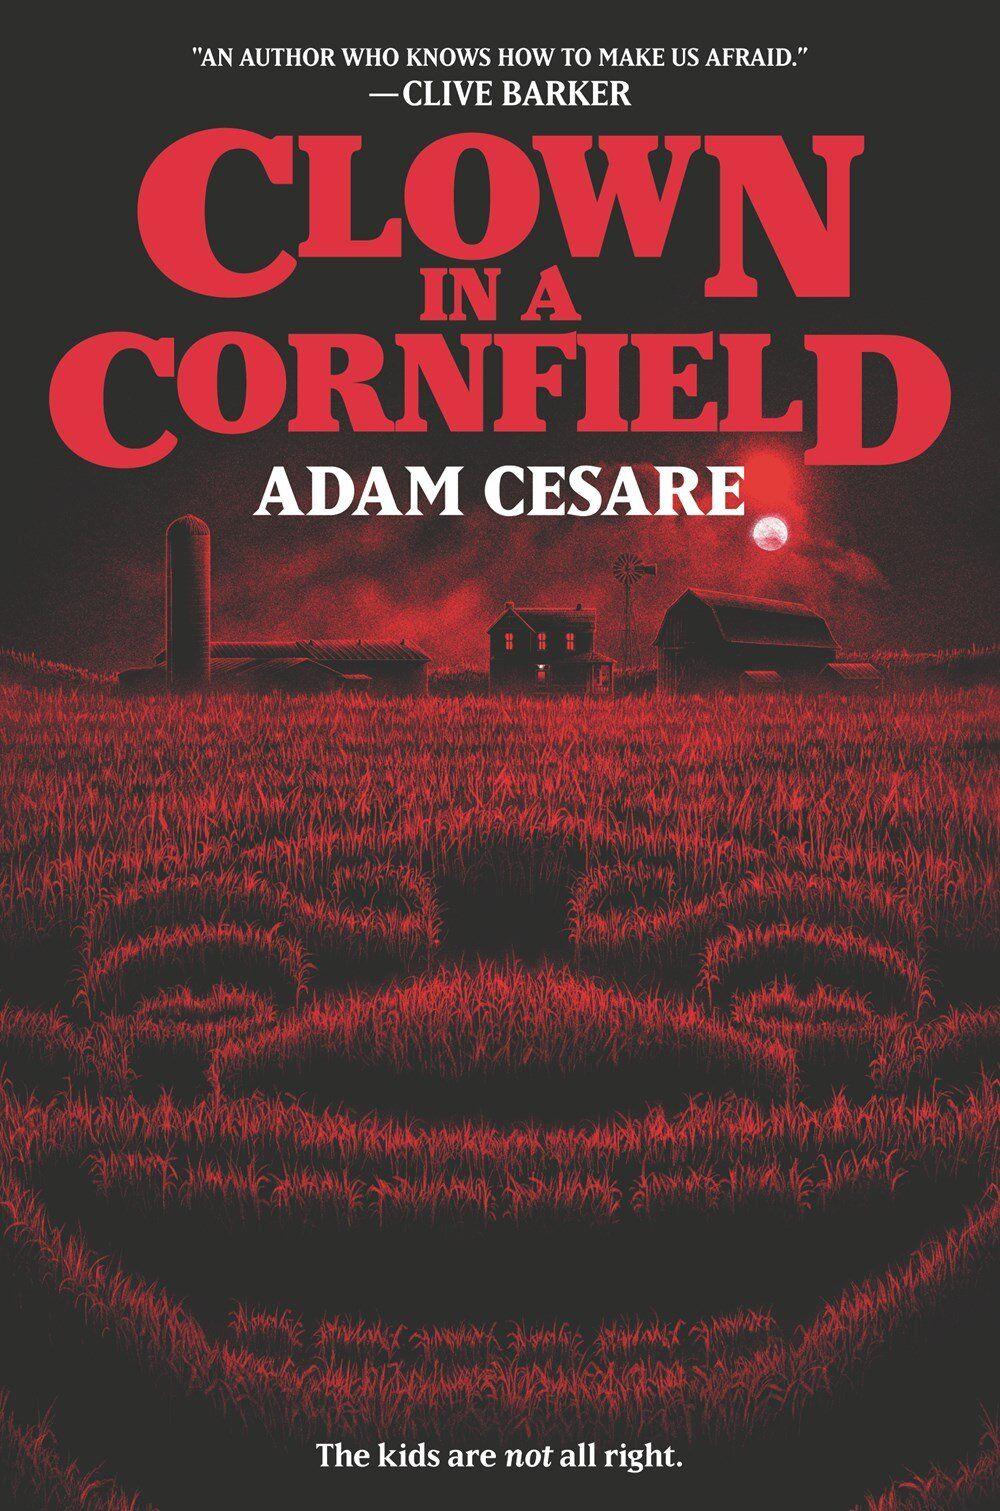 Clown in a cornfield by adam cesare in 2020 books young